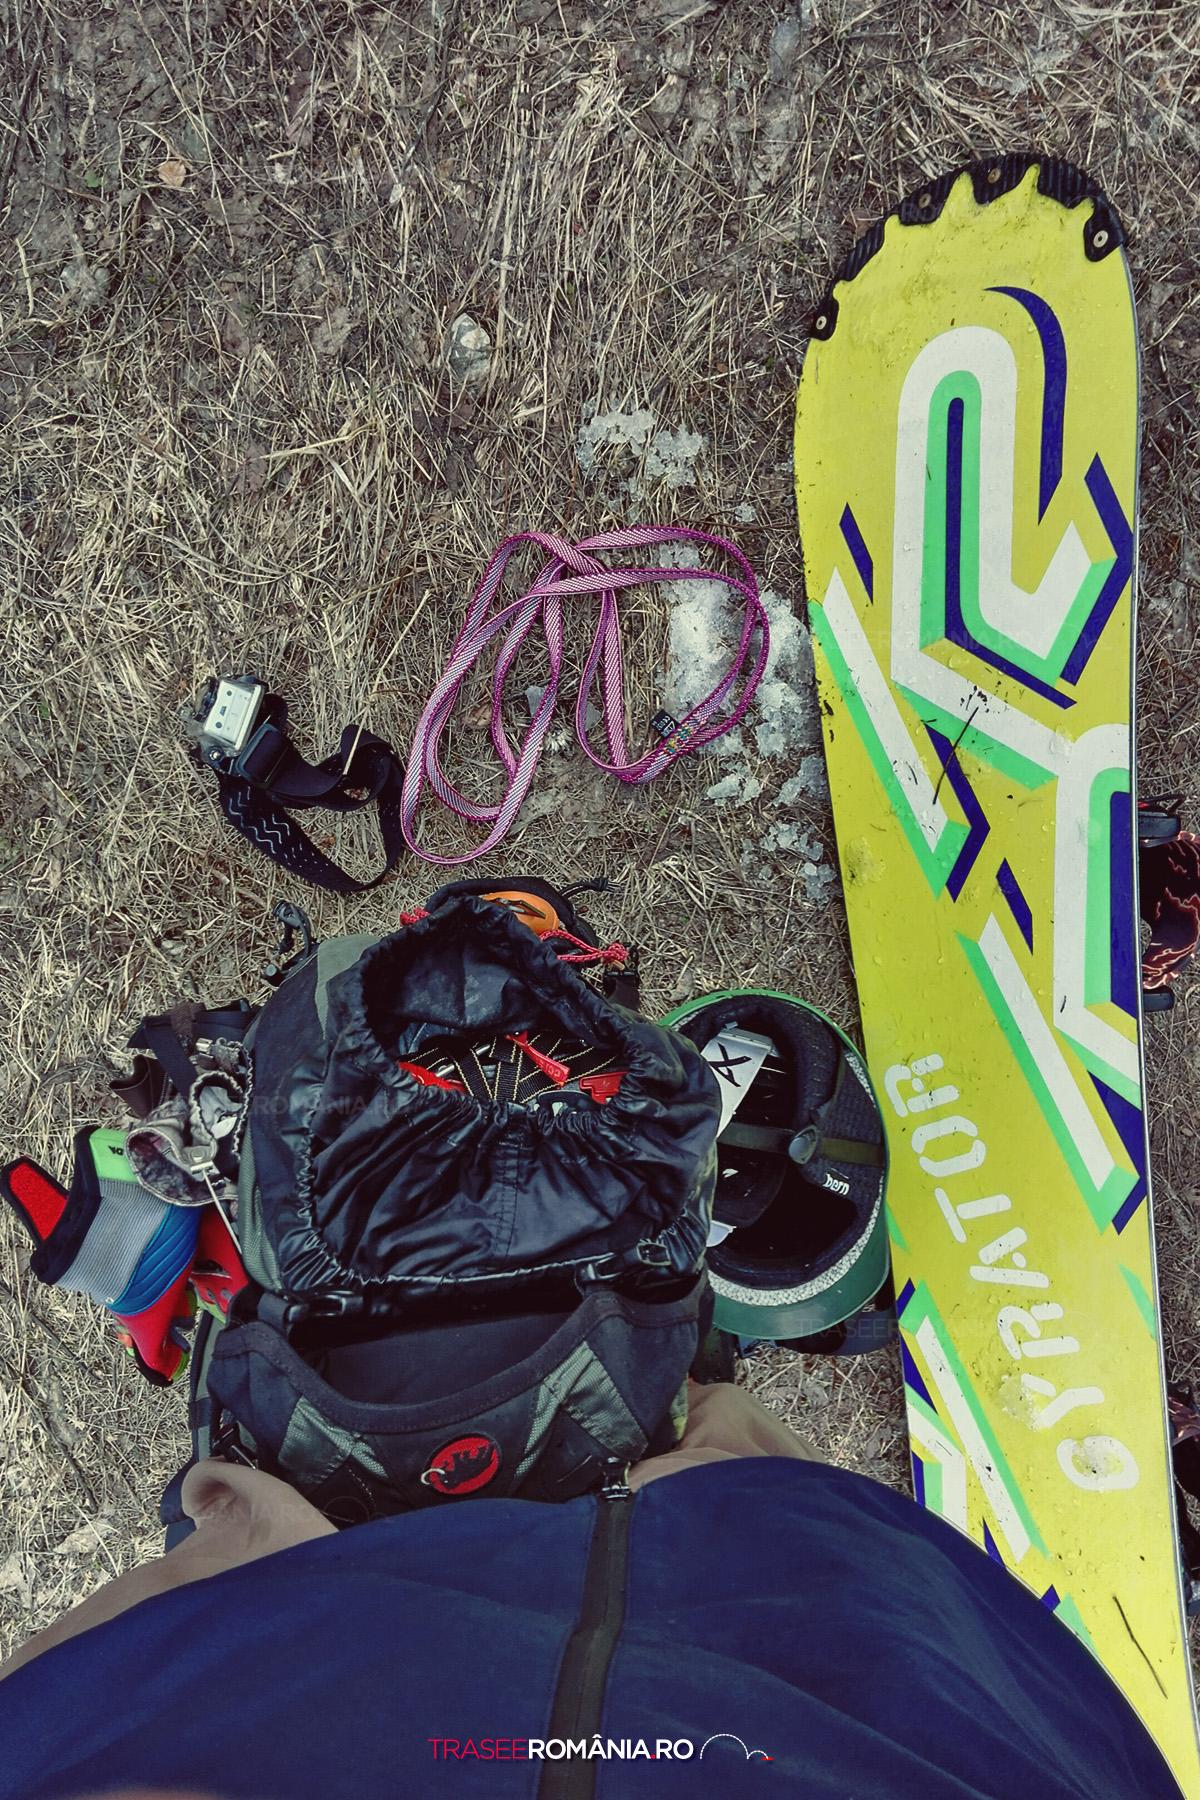 Echipament de snowborading off-piste